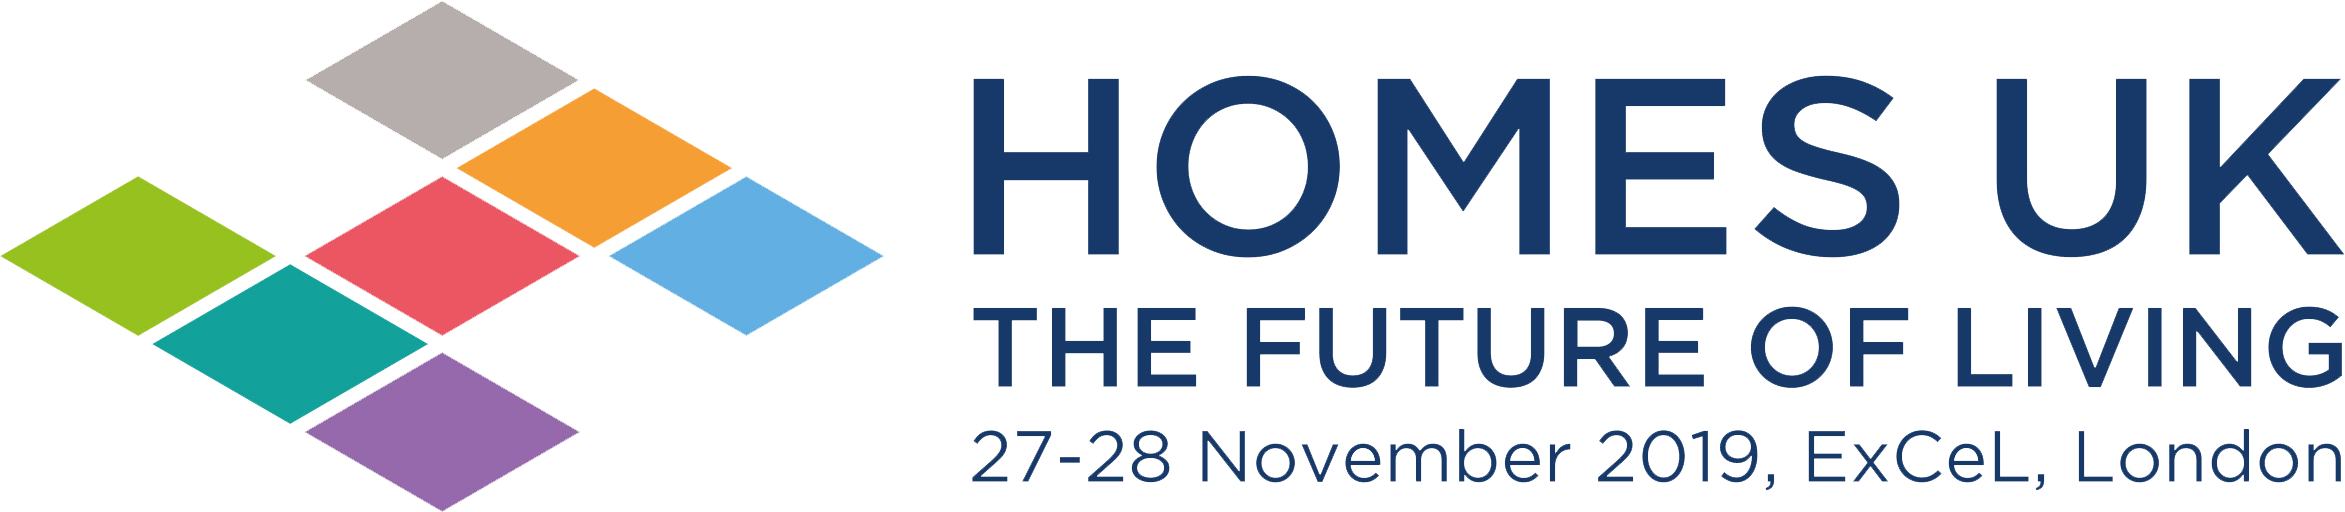 Homes UK 2019